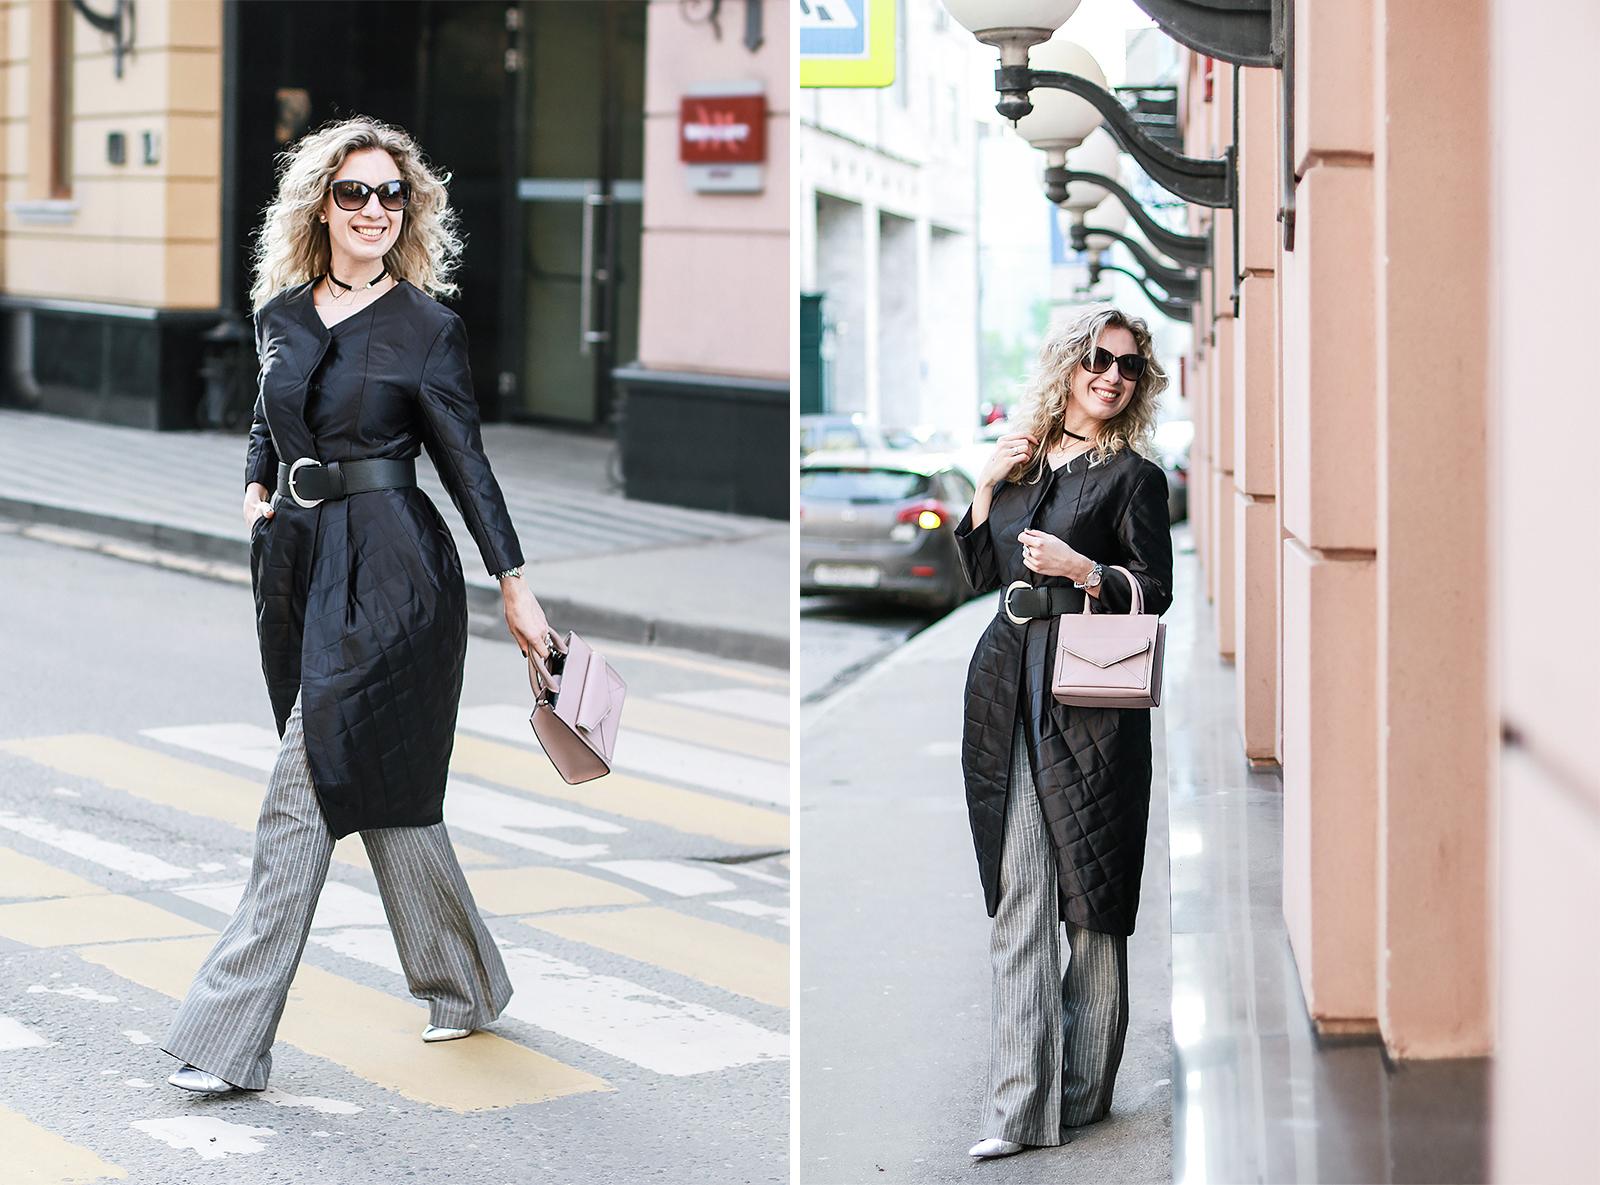 Margarita_Maslova_Ritalifestyle_Fashion_blogger_Moscow_belt_coat_black_silver_shoes_outfitMargarita_Maslova_Ritalifestyle_Fashion_blogger_Moscow_belt_coat_black_silver_shoes_outfit